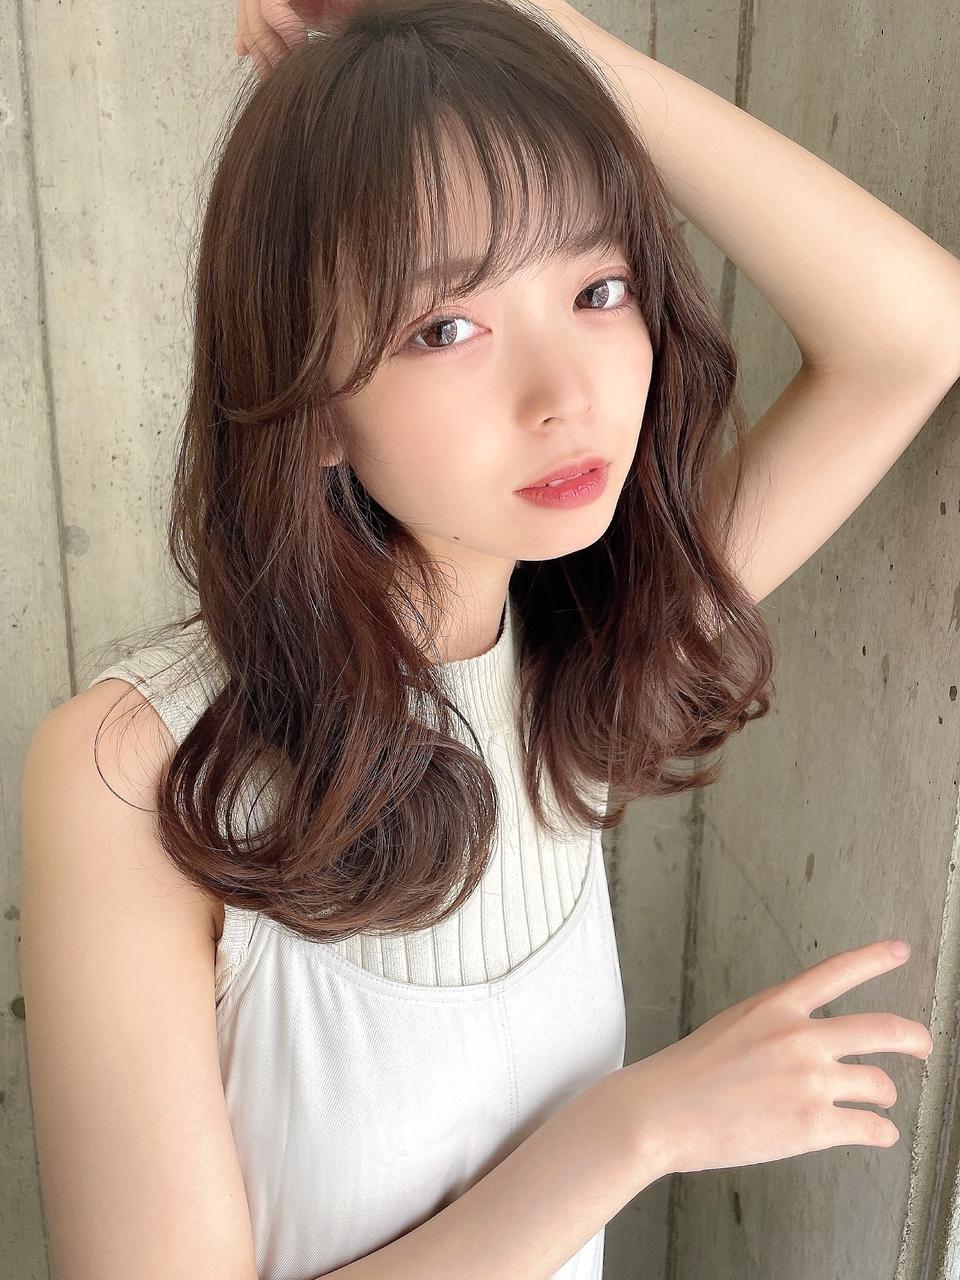 【Lond damaskRose】柴田祐希 大人可愛いフェイスレイヤー